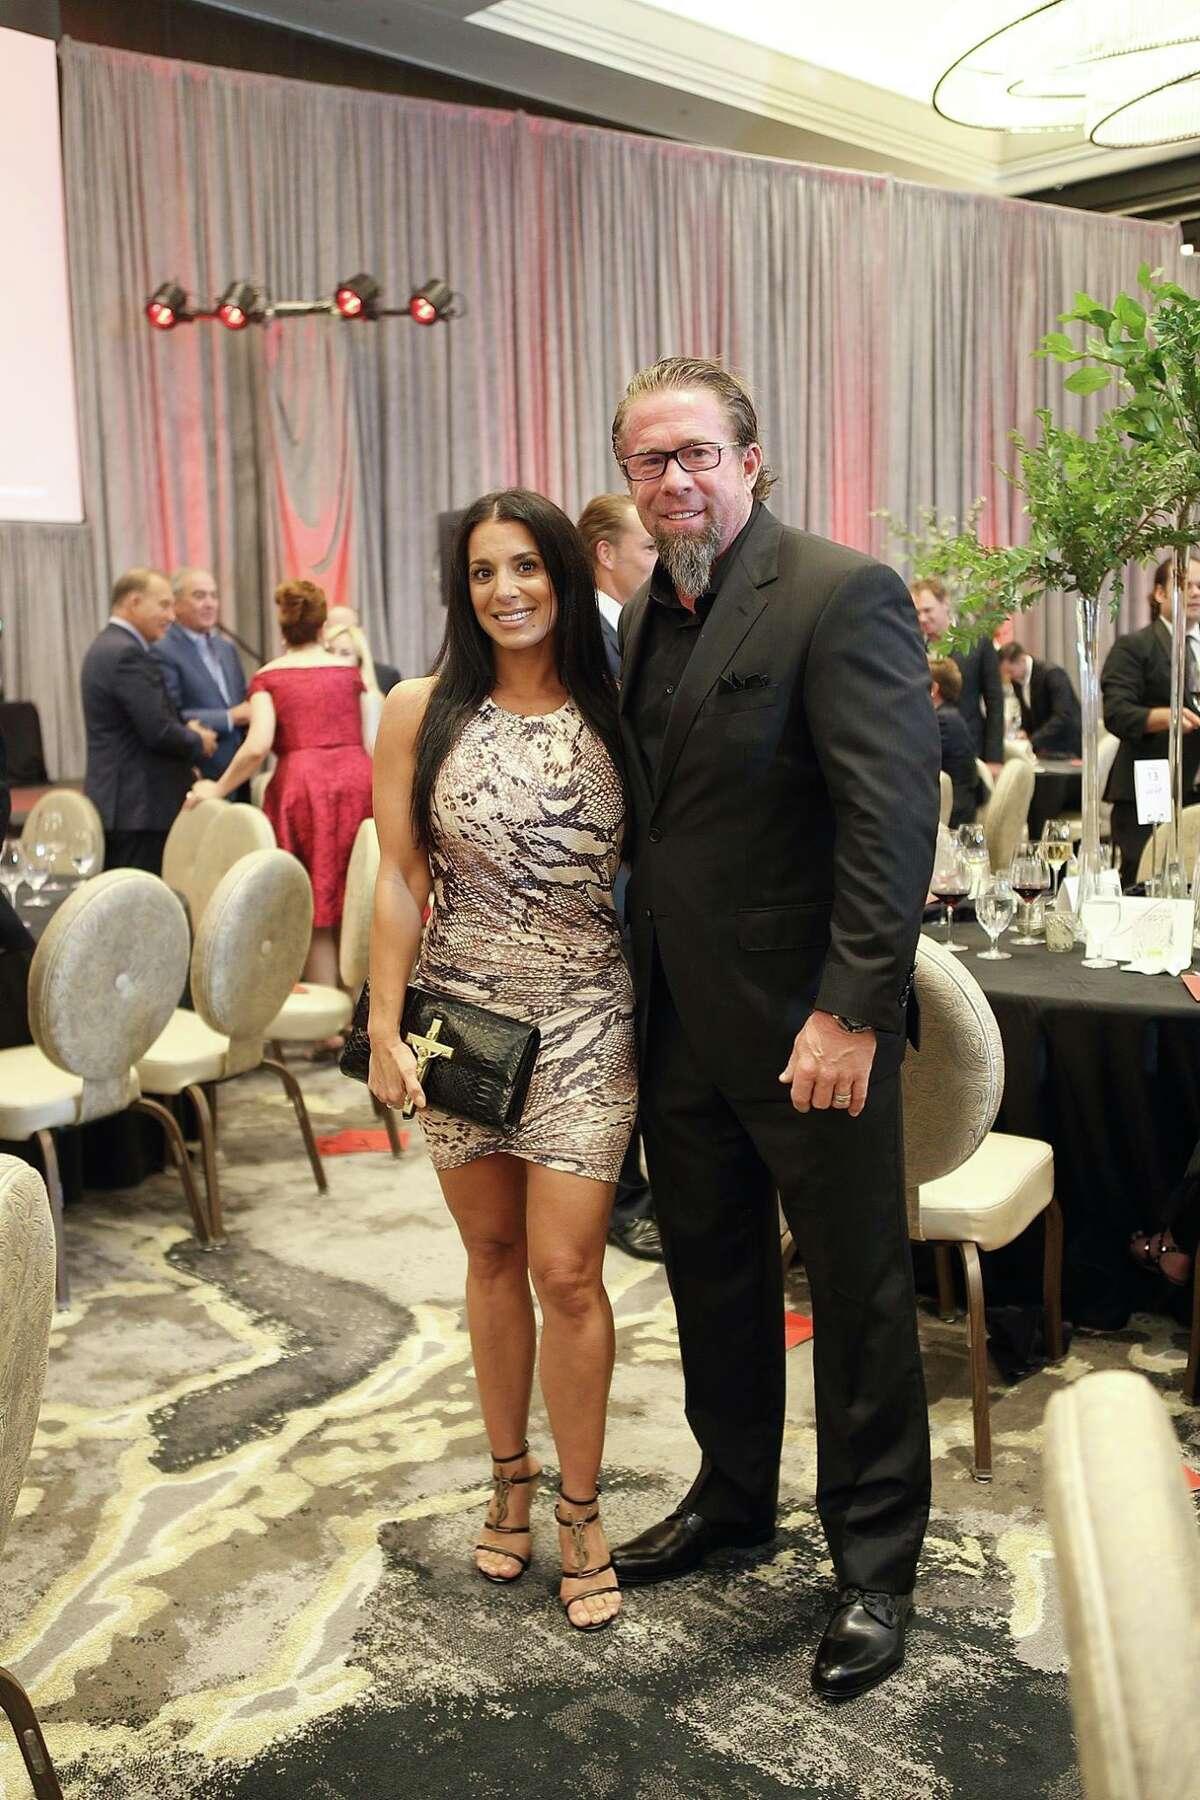 Rachel and Jeff Bagwell